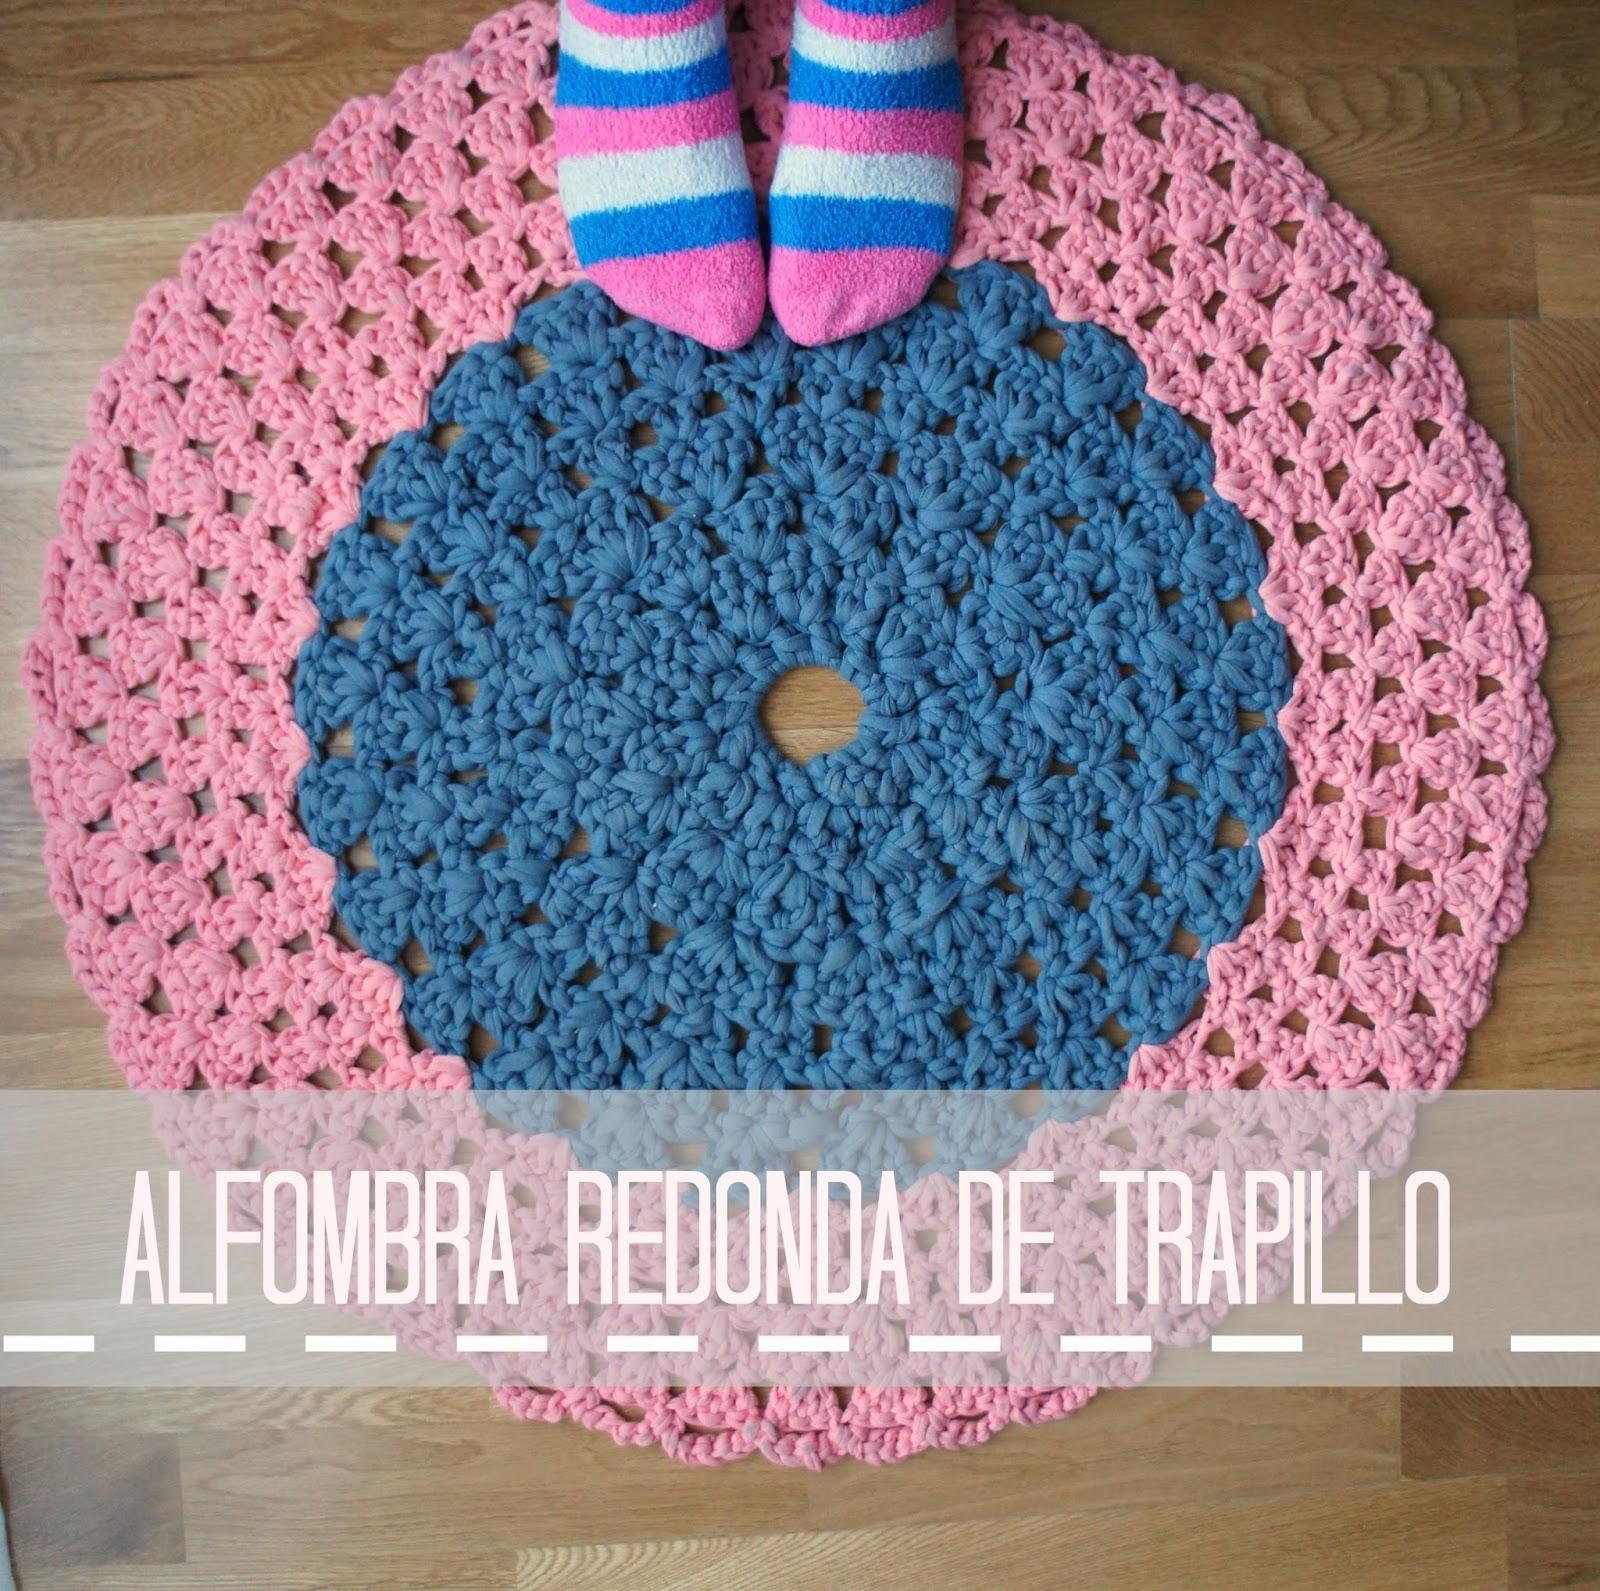 Pinafili diy alfombra redonda de trapillo - Alfombras redondas ...